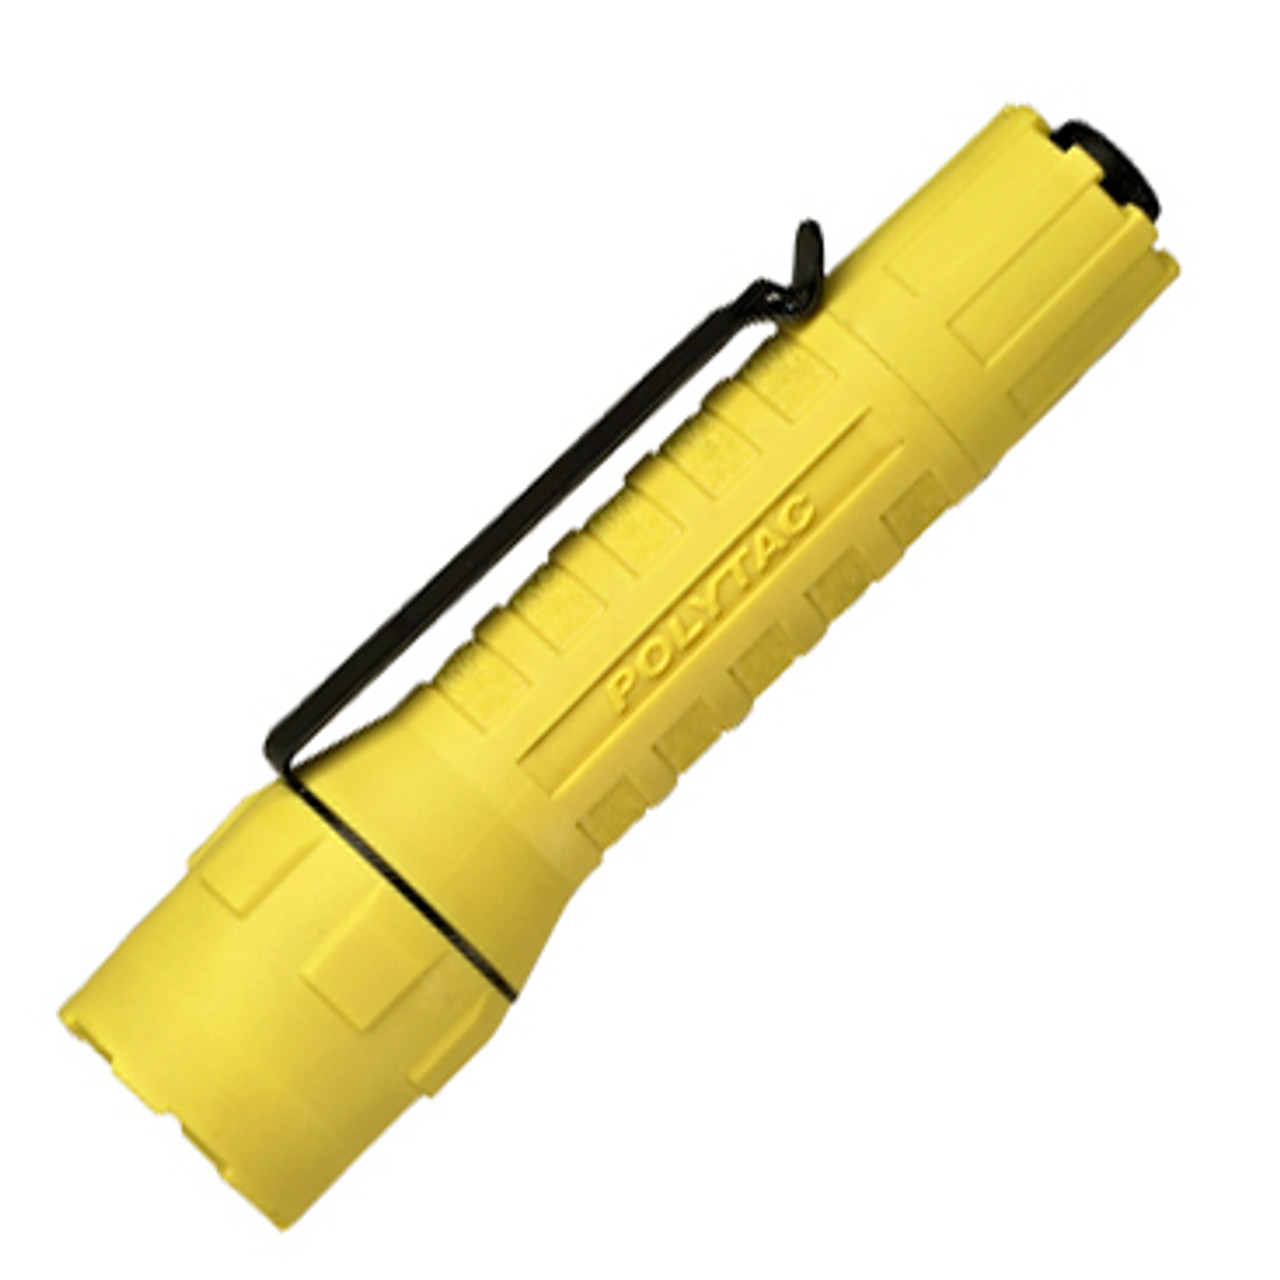 Streamlight PolyTac Tactical Flashlight 88853, C4 LED Light, 600 Max Lumens, Coyote